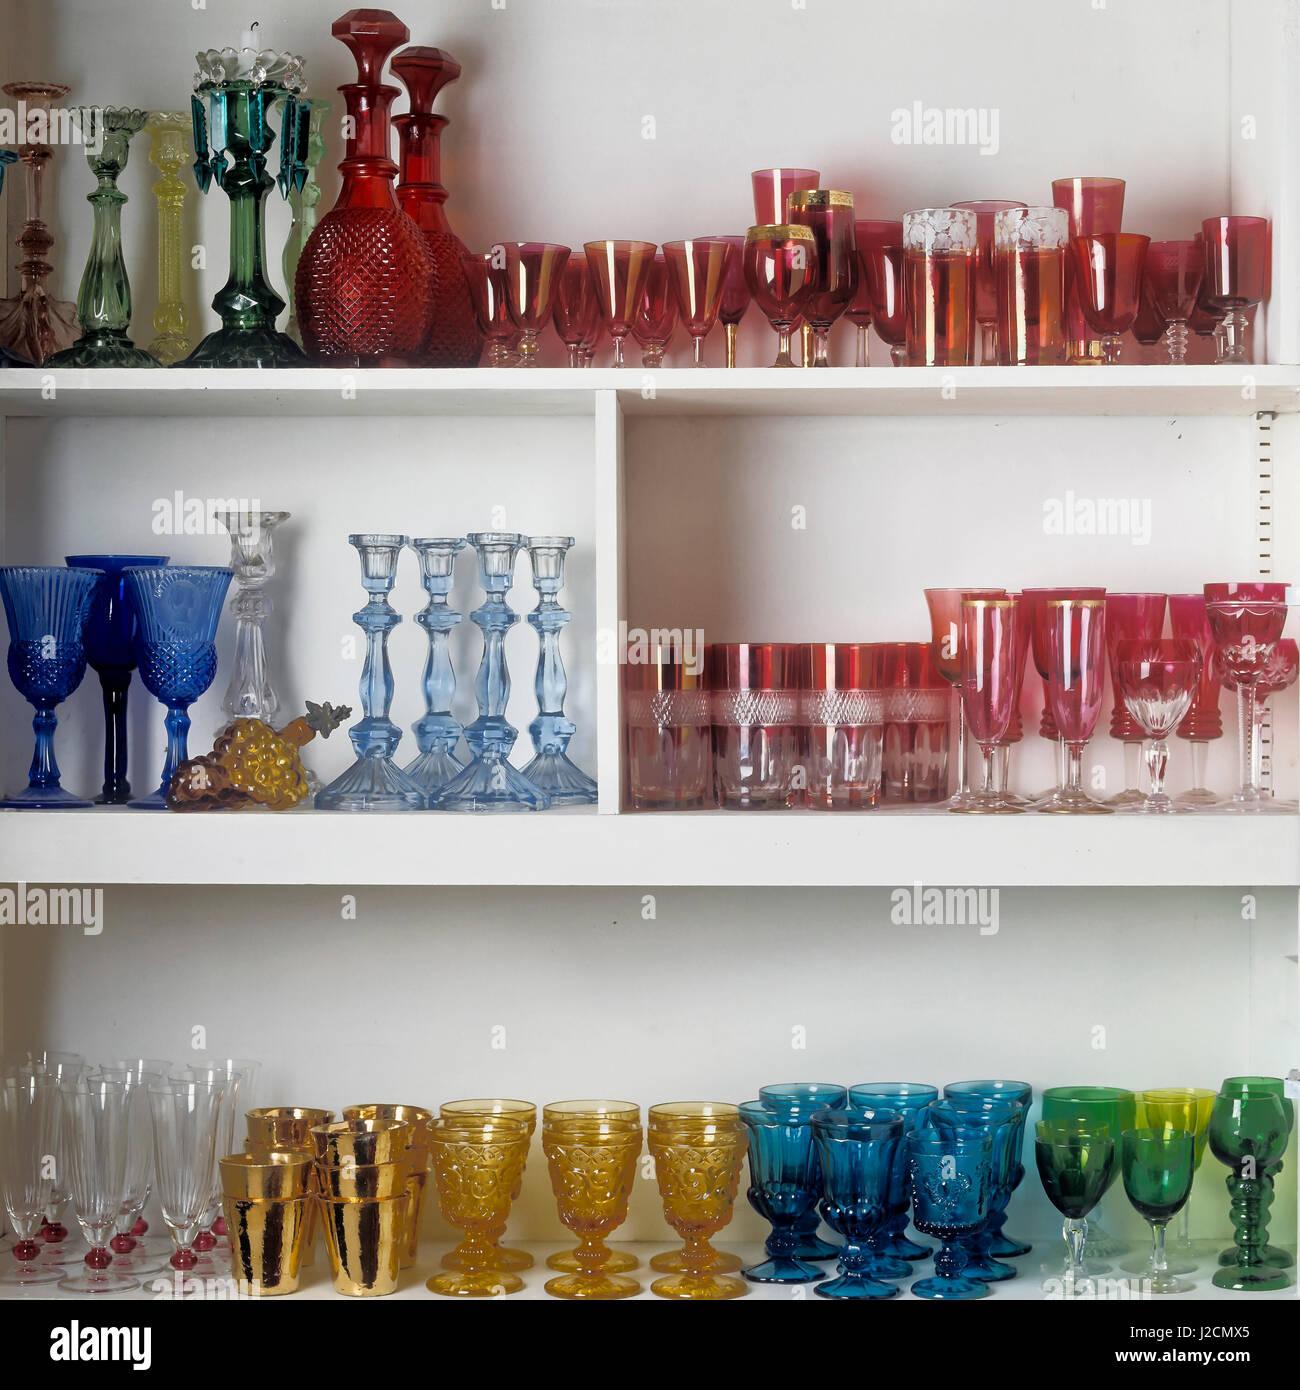 Estantes de vidrio de color. Imagen De Stock